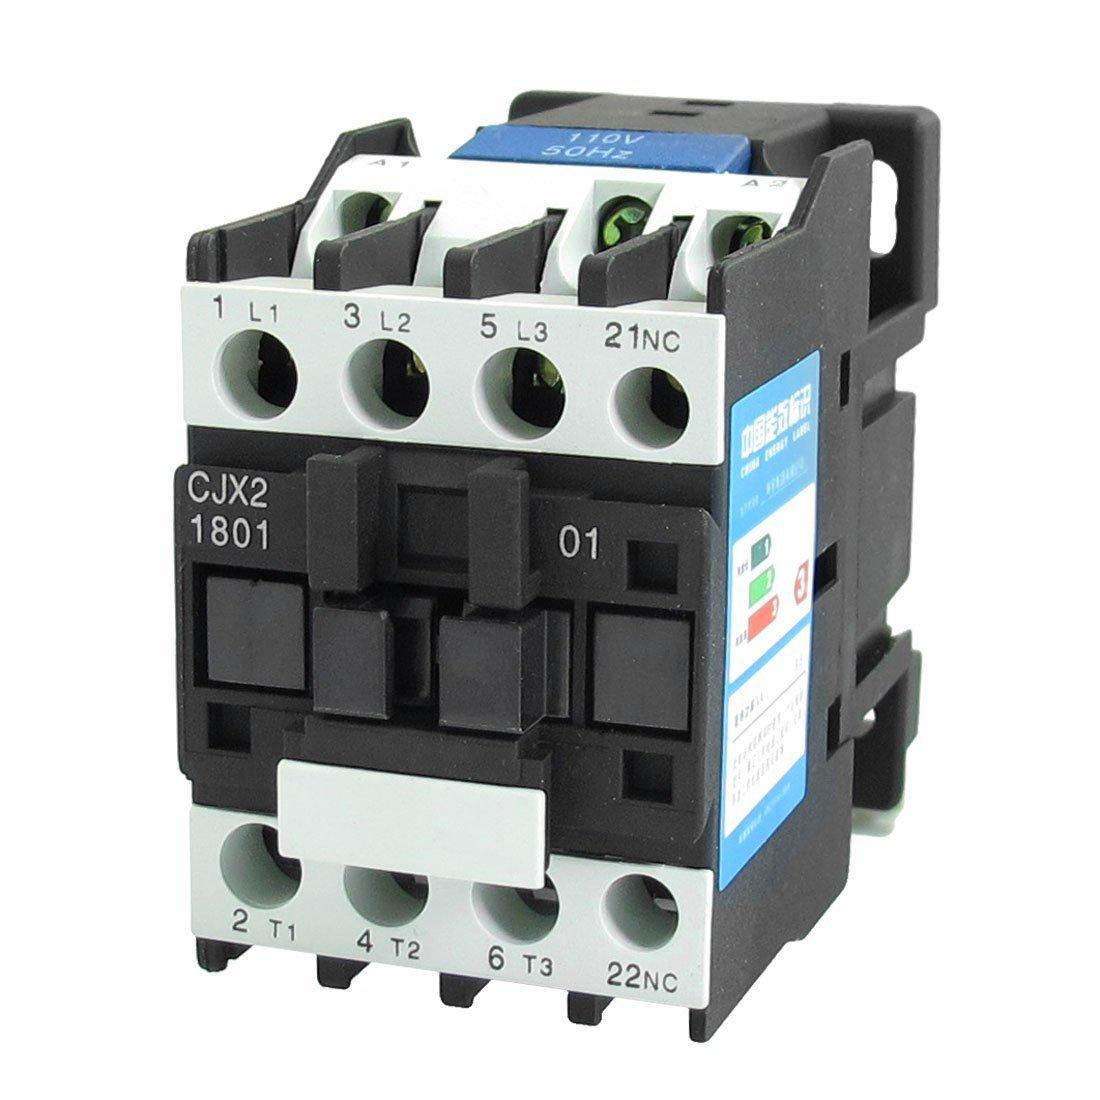 Baomain AC Contactor CJX2-1801 110V Coil 3P 3 Pole 660V 32A NC(Normally Closed)